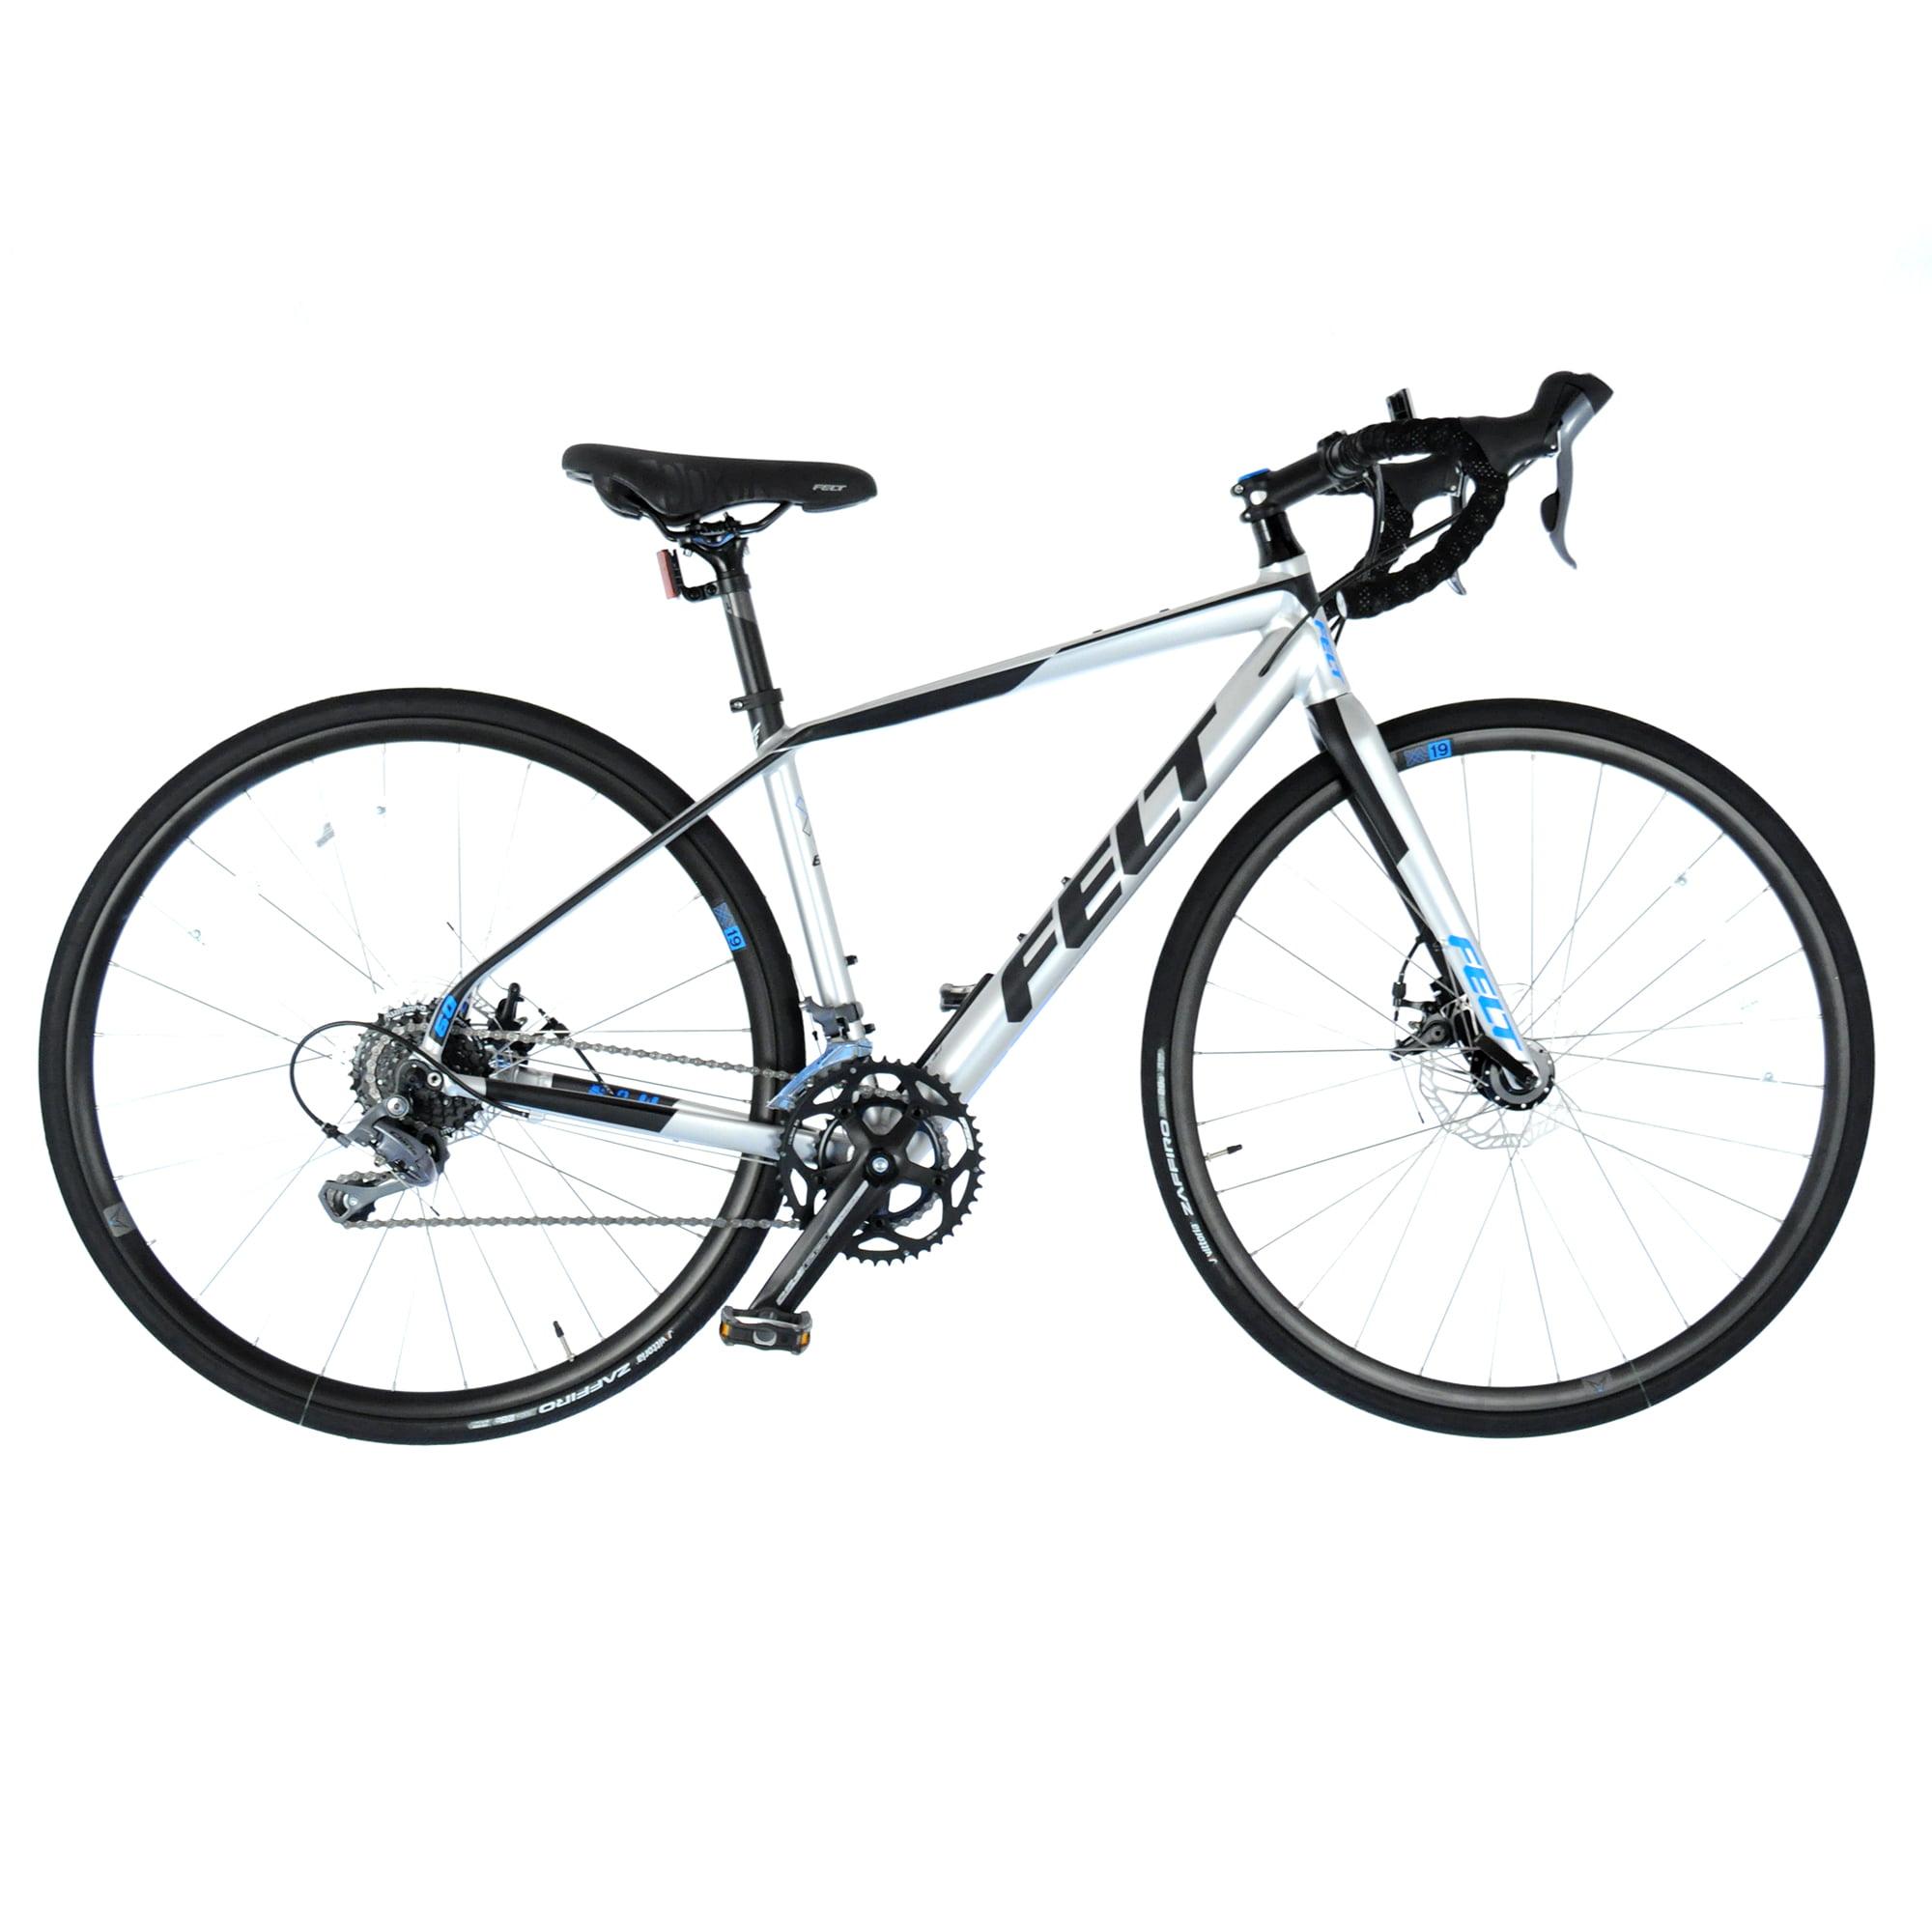 2017 Felt VR60 Disc Road Bike w/ Carbon Fork Shimano Claris 8 Speed // 47cm